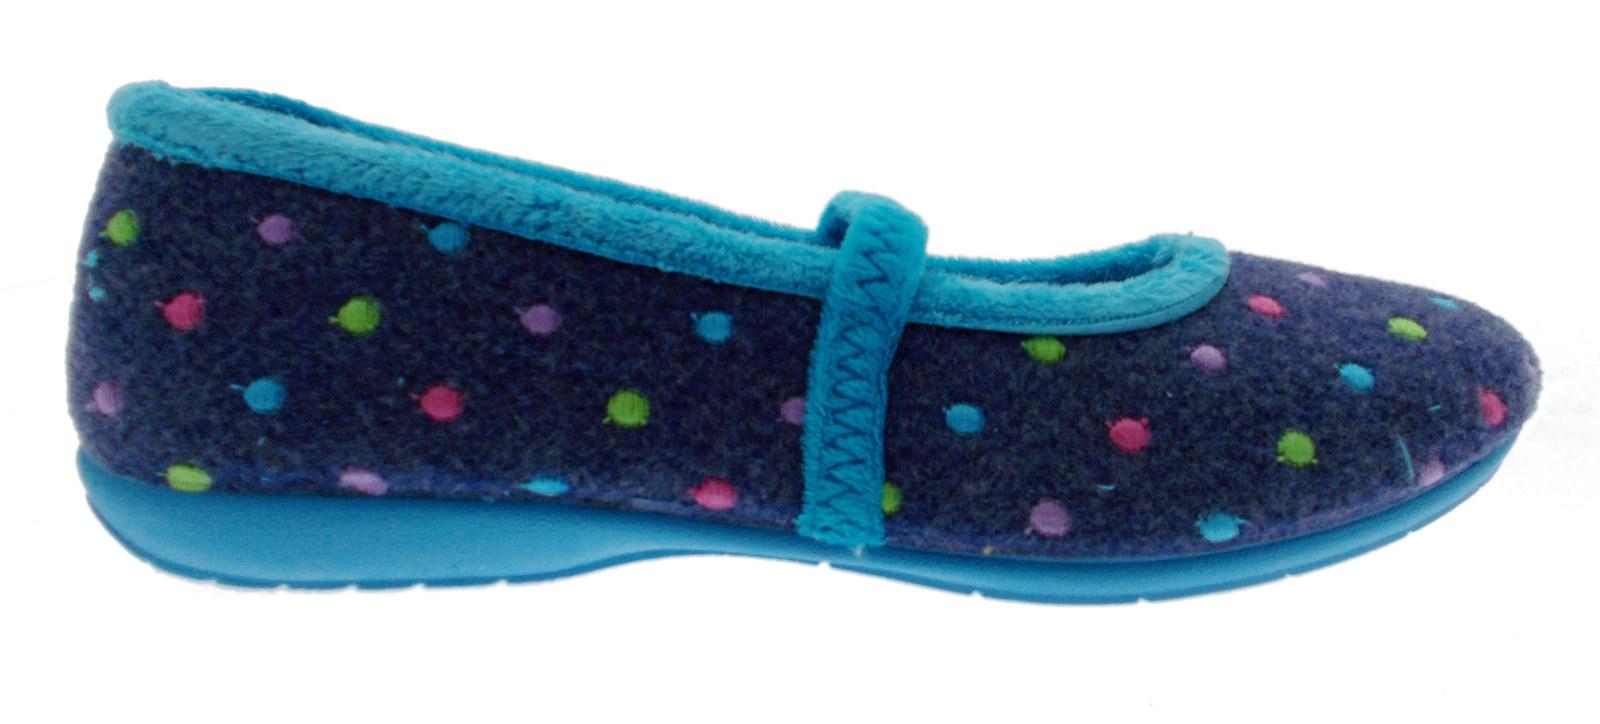 Zapatillas De Tela Azul Lunares Polka Azul De Fieltro Correa Correa Correa Eland  varios tamaños